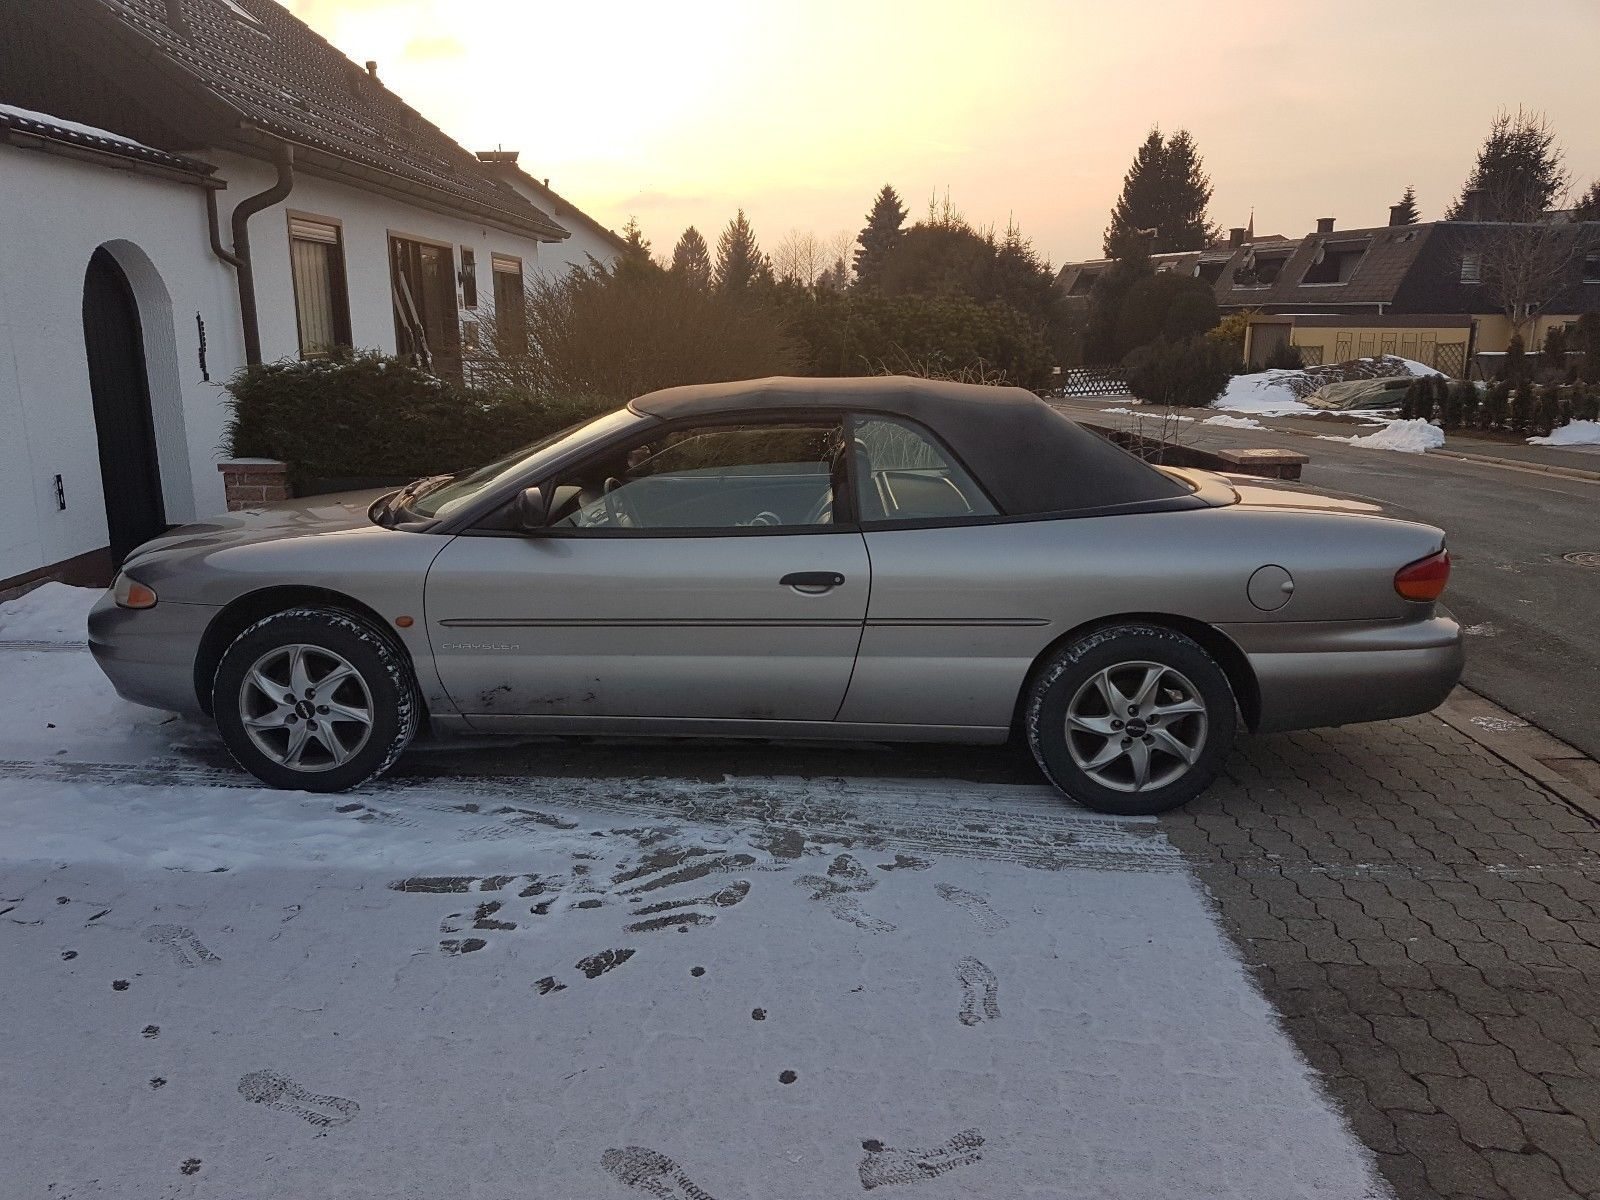 eBay.de - Mobiles günstiger - Daimlerchrysler Chrysler Stratus ...